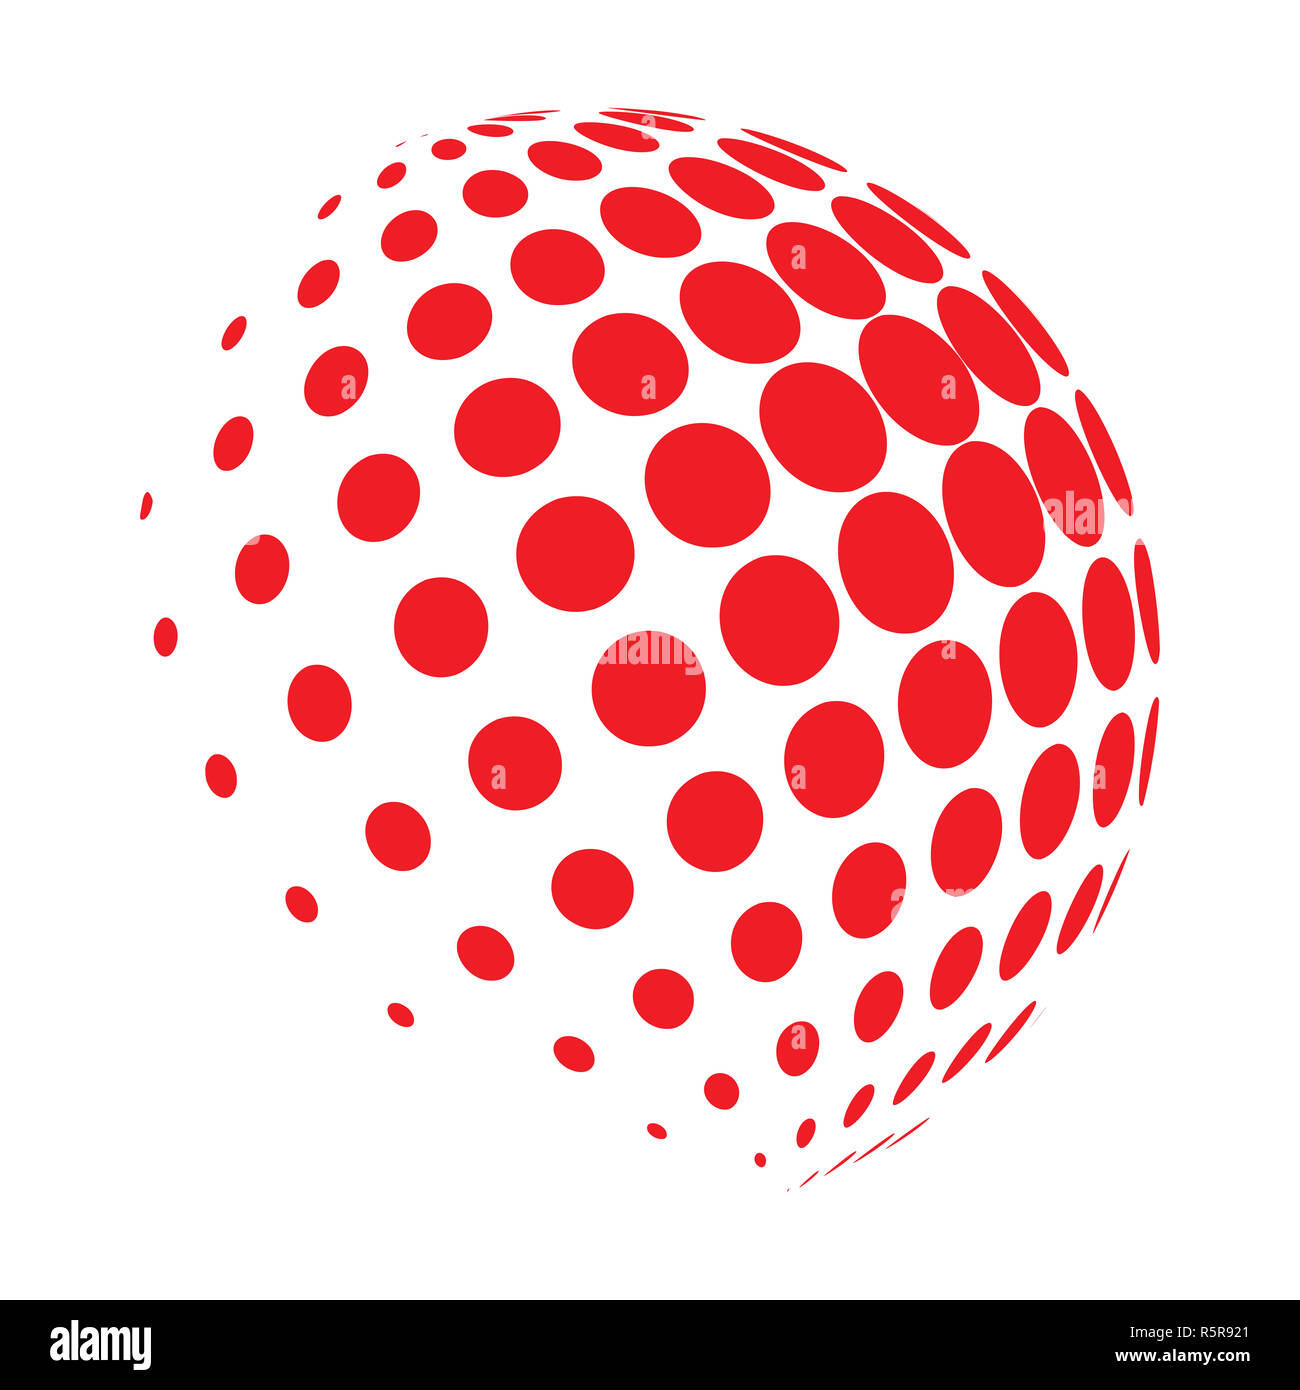 halftone globe logo vector symbol icon design Stock Photo: 227320073